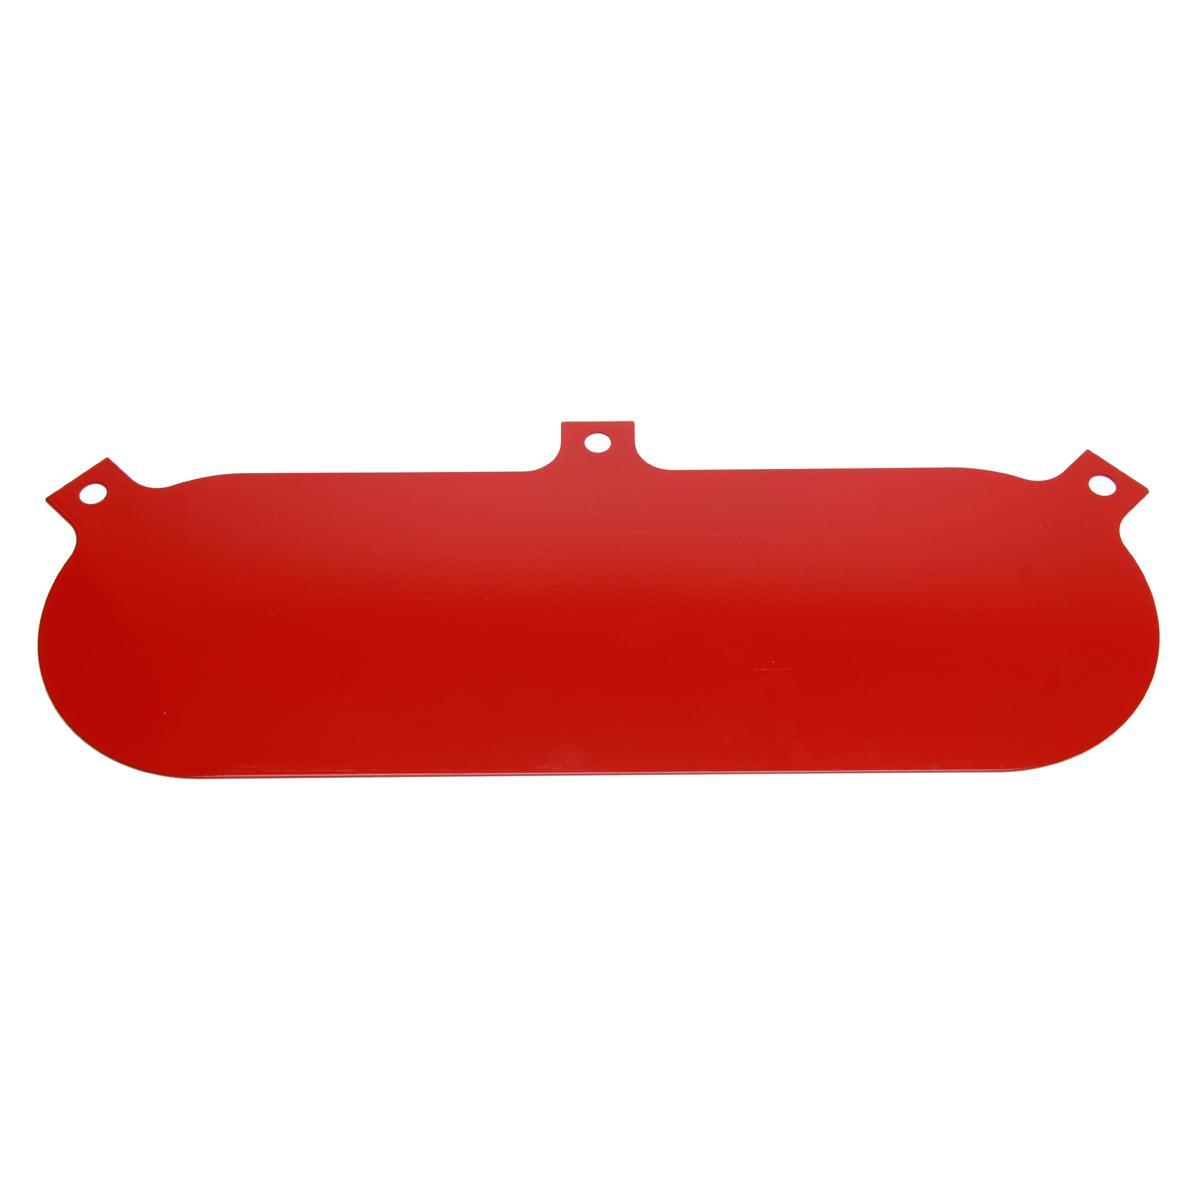 Itg jc50 baseplate 17jc50 from merlin motorsport for Motor base plate design